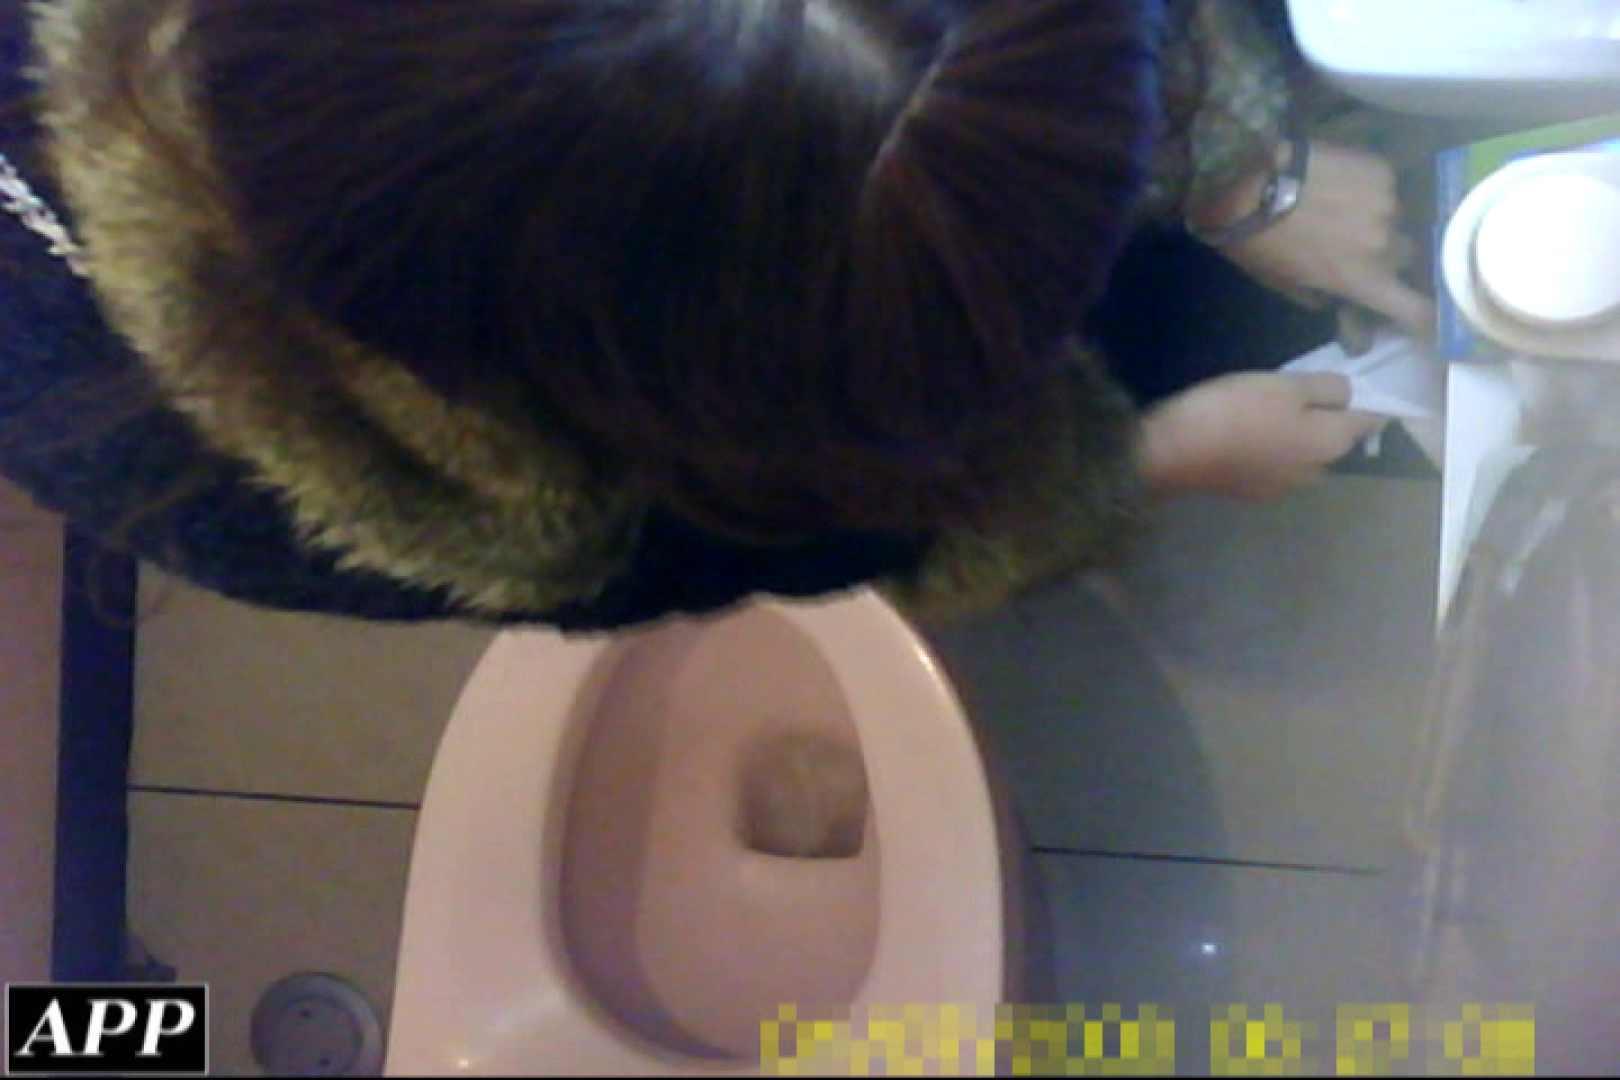 3視点洗面所 vol.77 肛門 | マンコ満開  94PIX 19